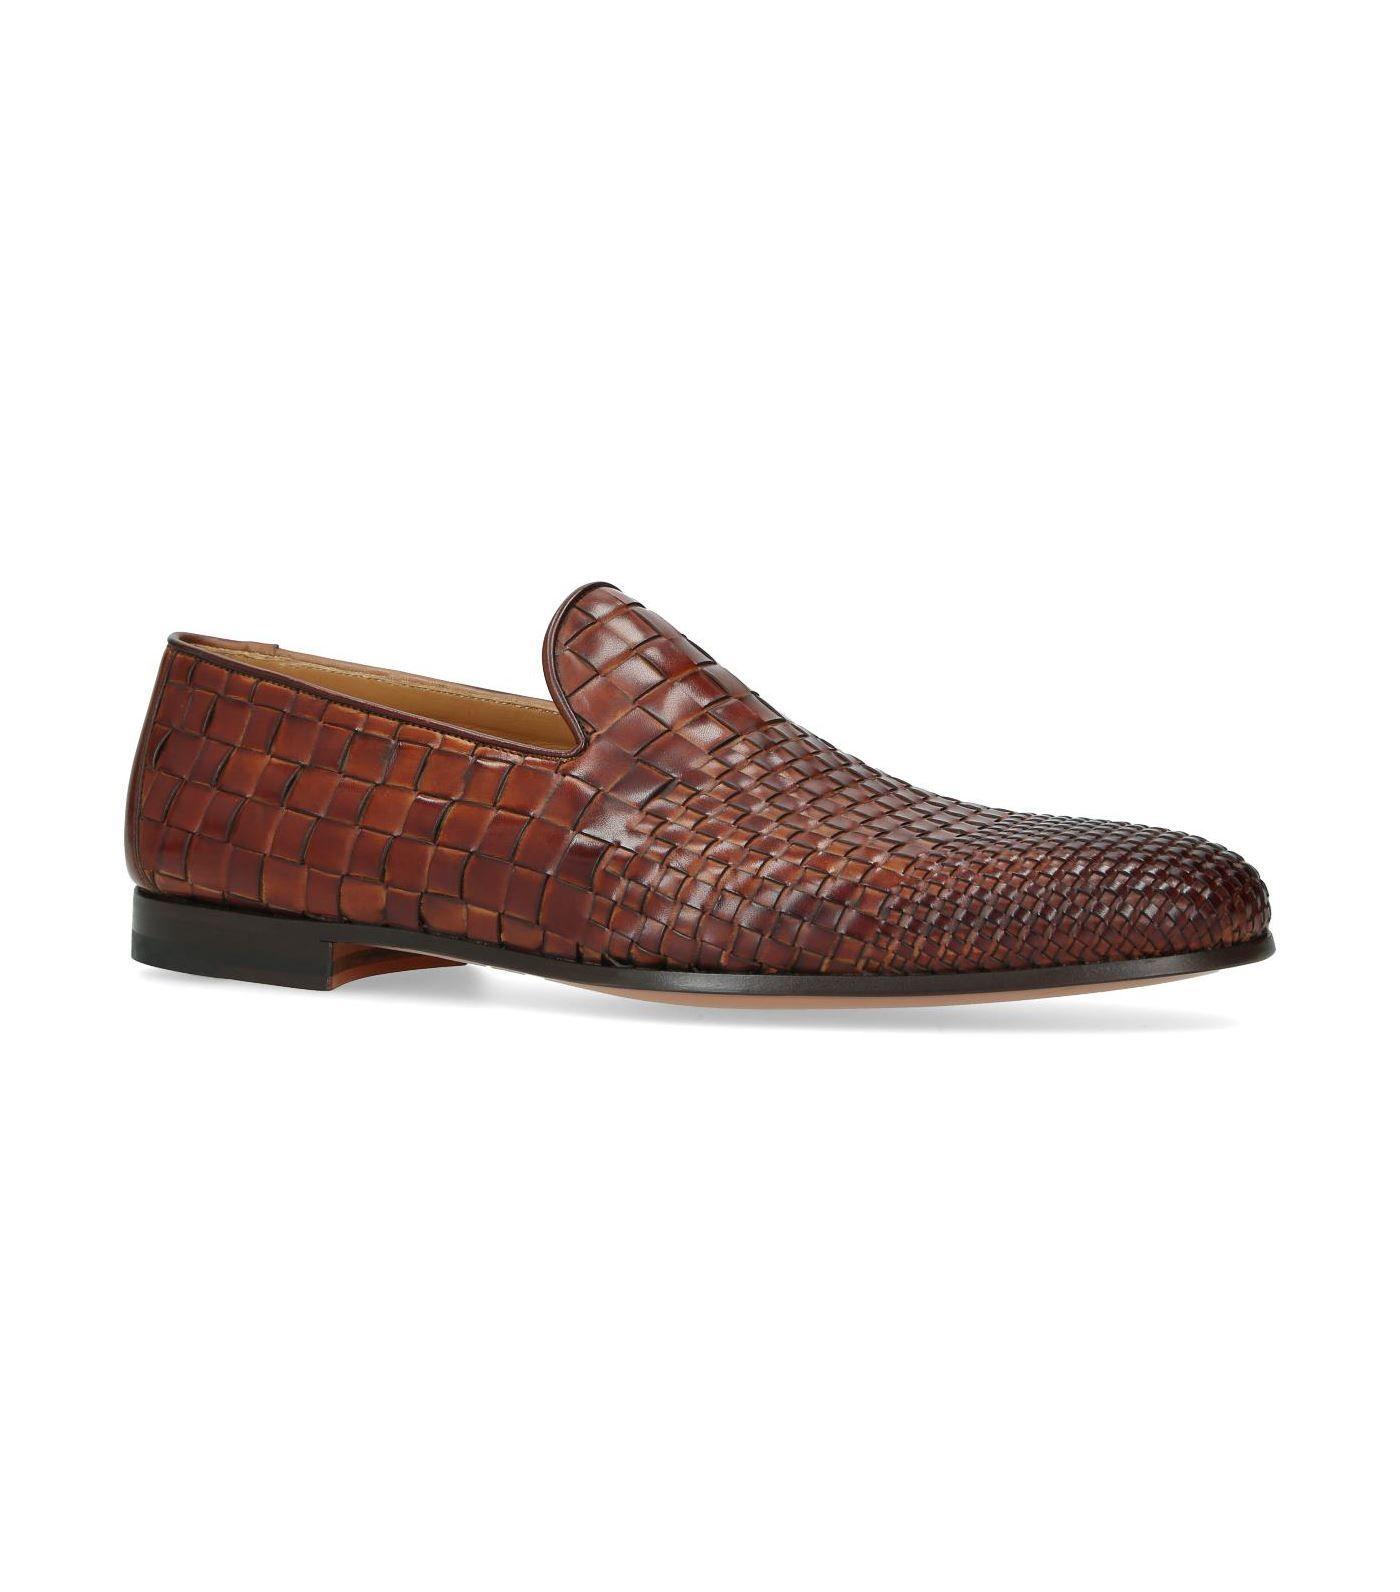 3fffe707c6e MAGNANNI LEATHER WOVEN LOAFERS.  magnanni  shoes